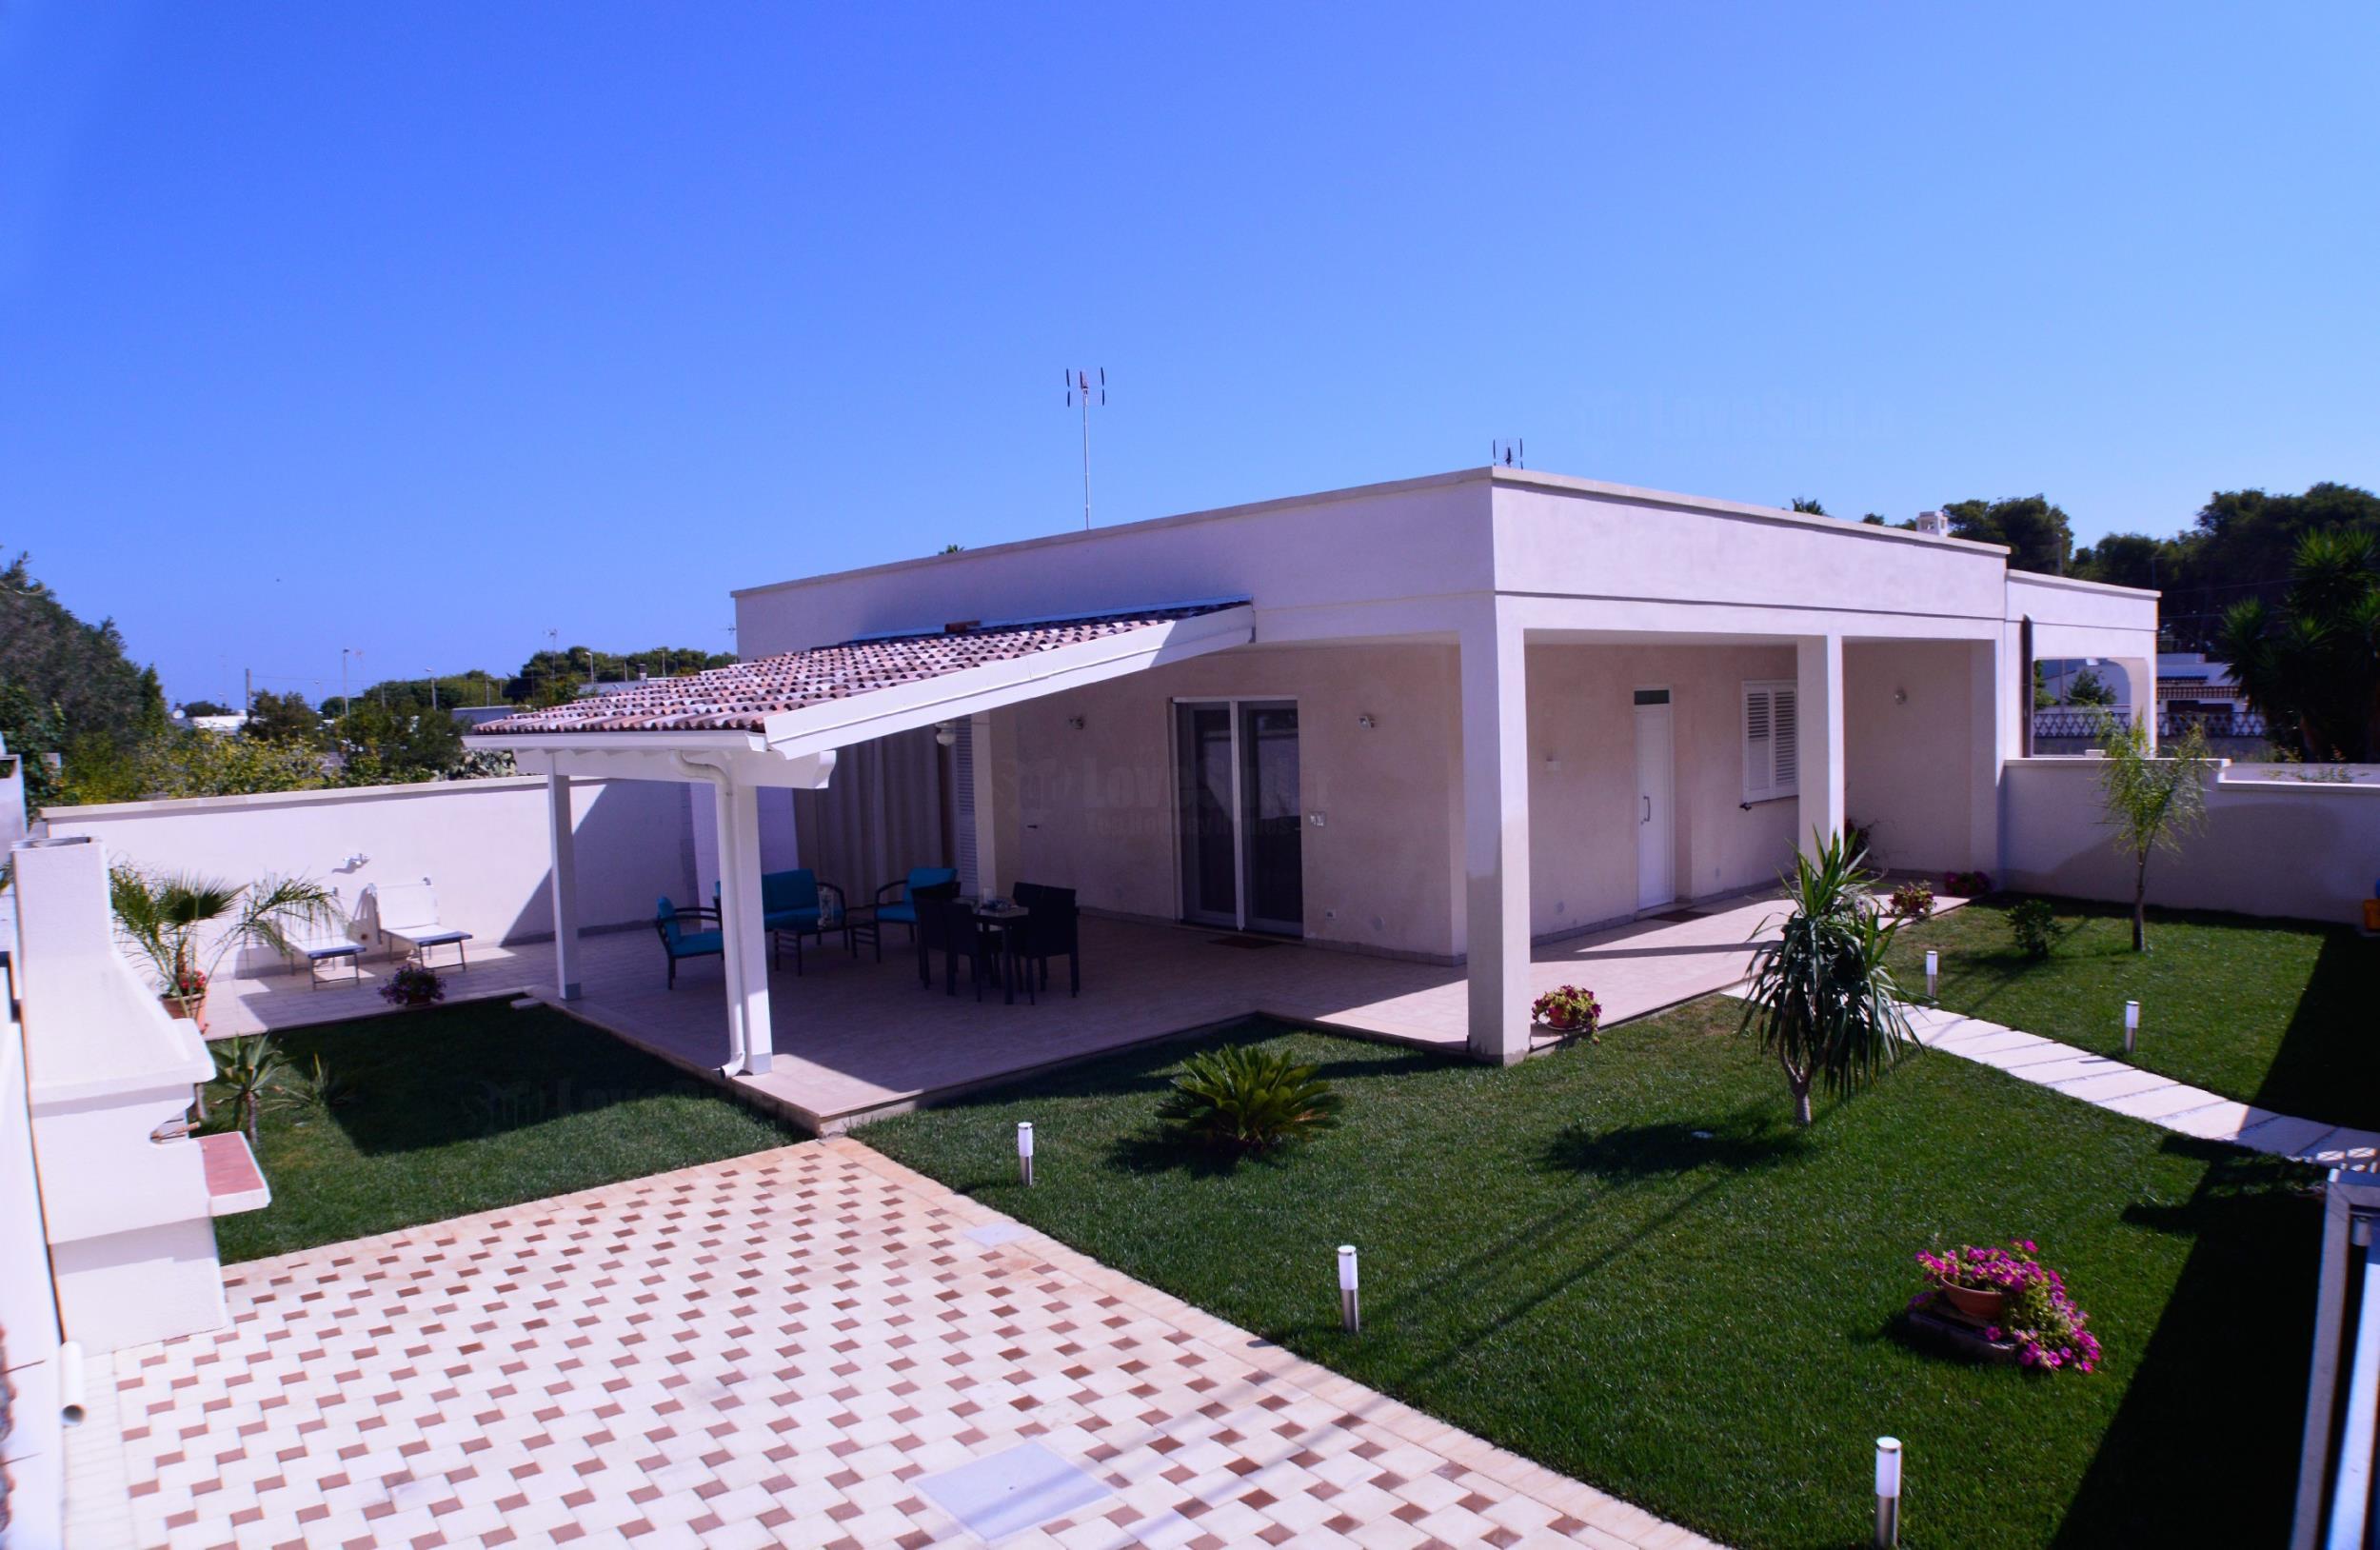 Apartment Elcisia luxe beach house photo 23457091